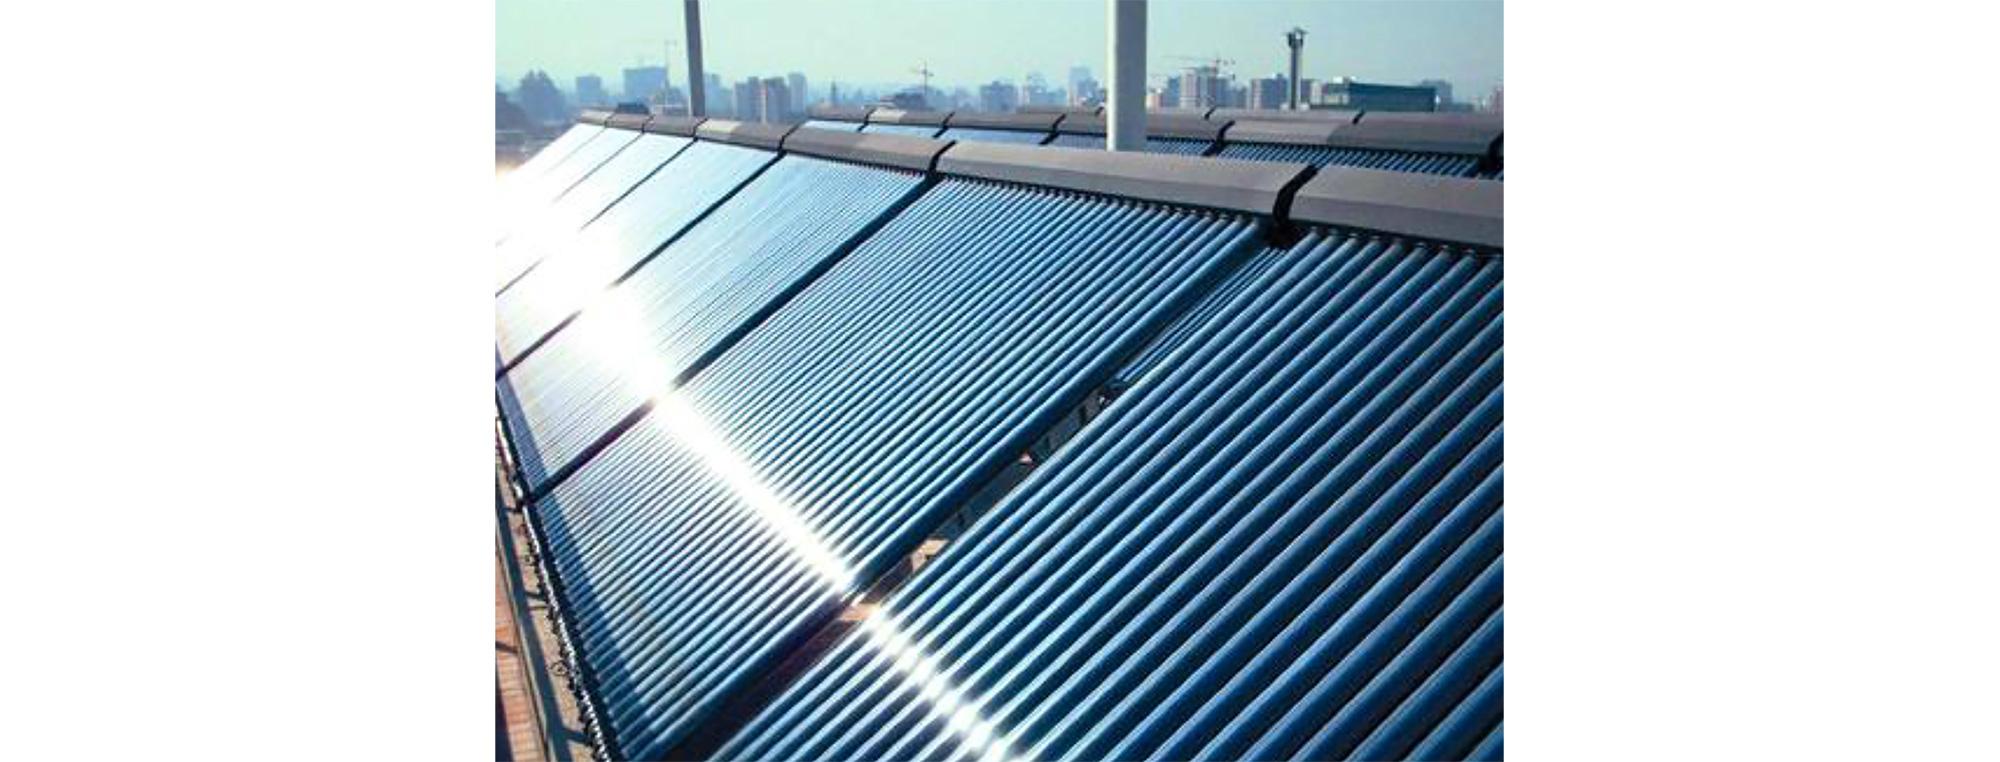 Fig. 16:Colectores solares para ACS.